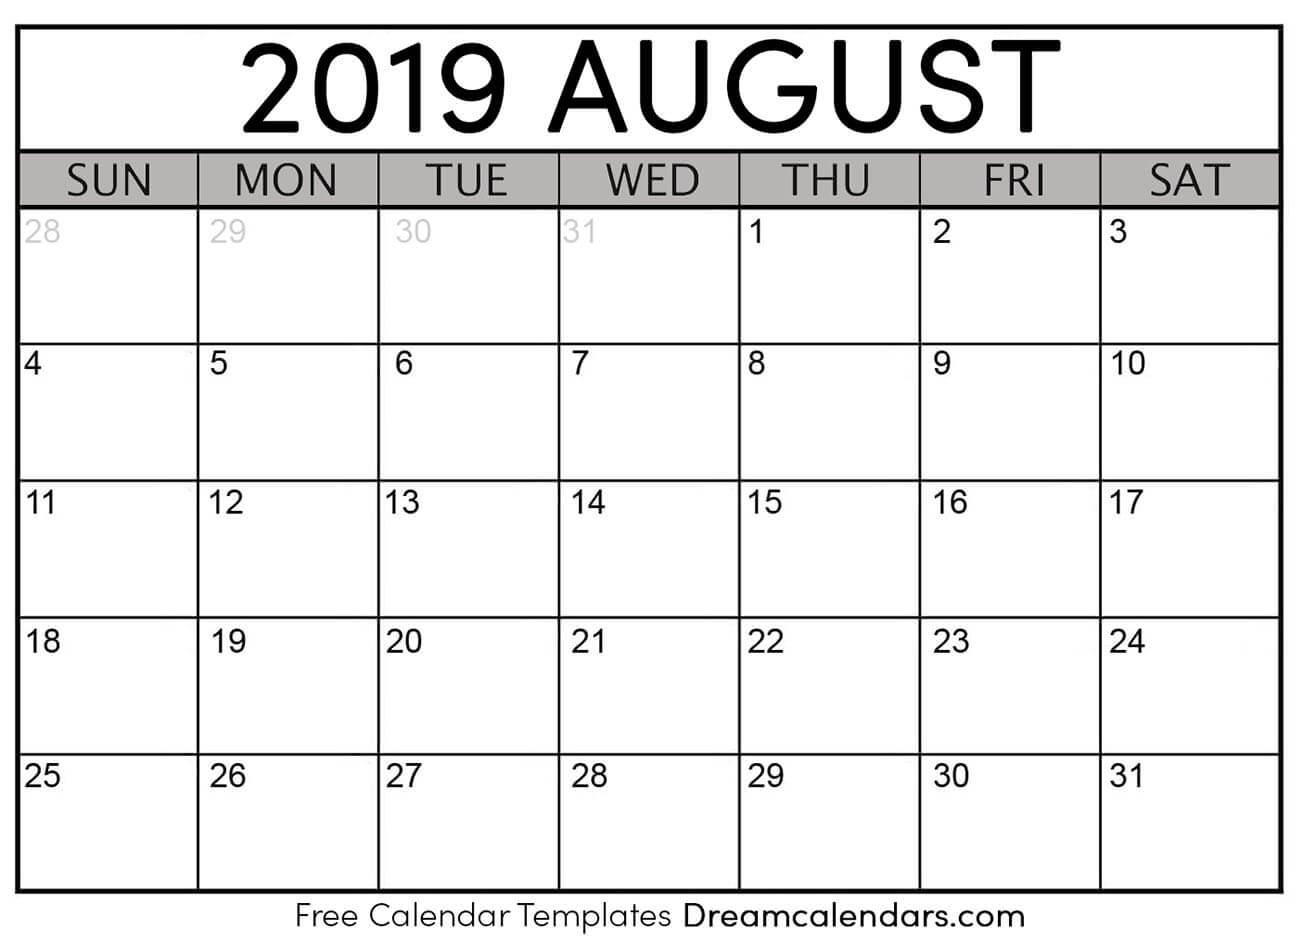 Free Blank August 2019 Printable Calendar